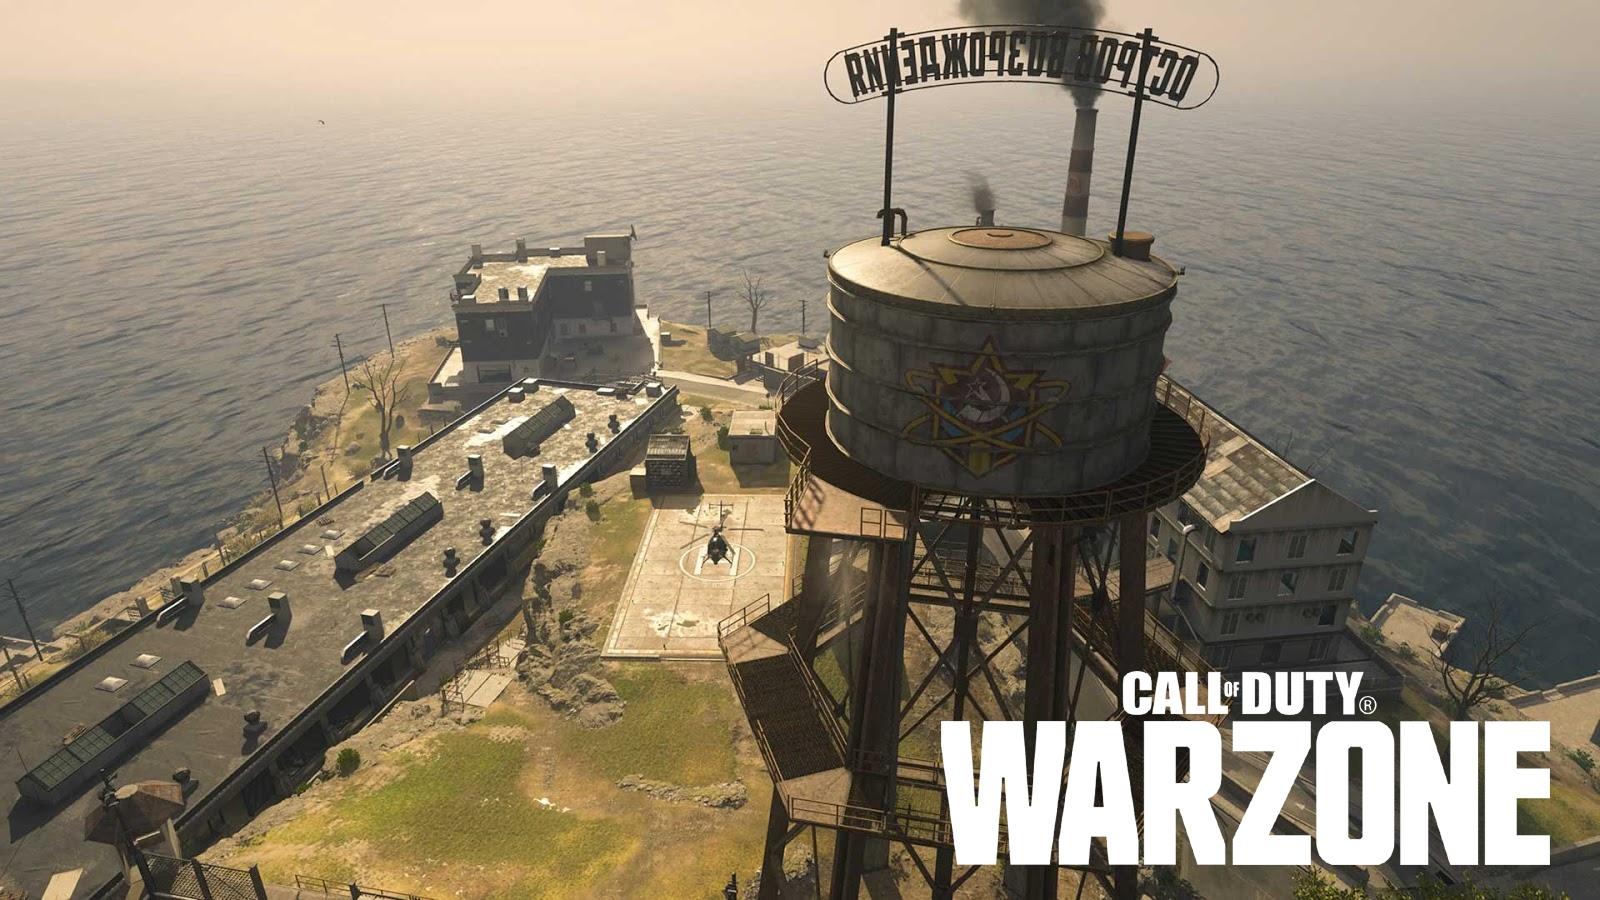 New Warzone Season 2 wall glitch makes players unkillable on Rebirth Island - Dexerto